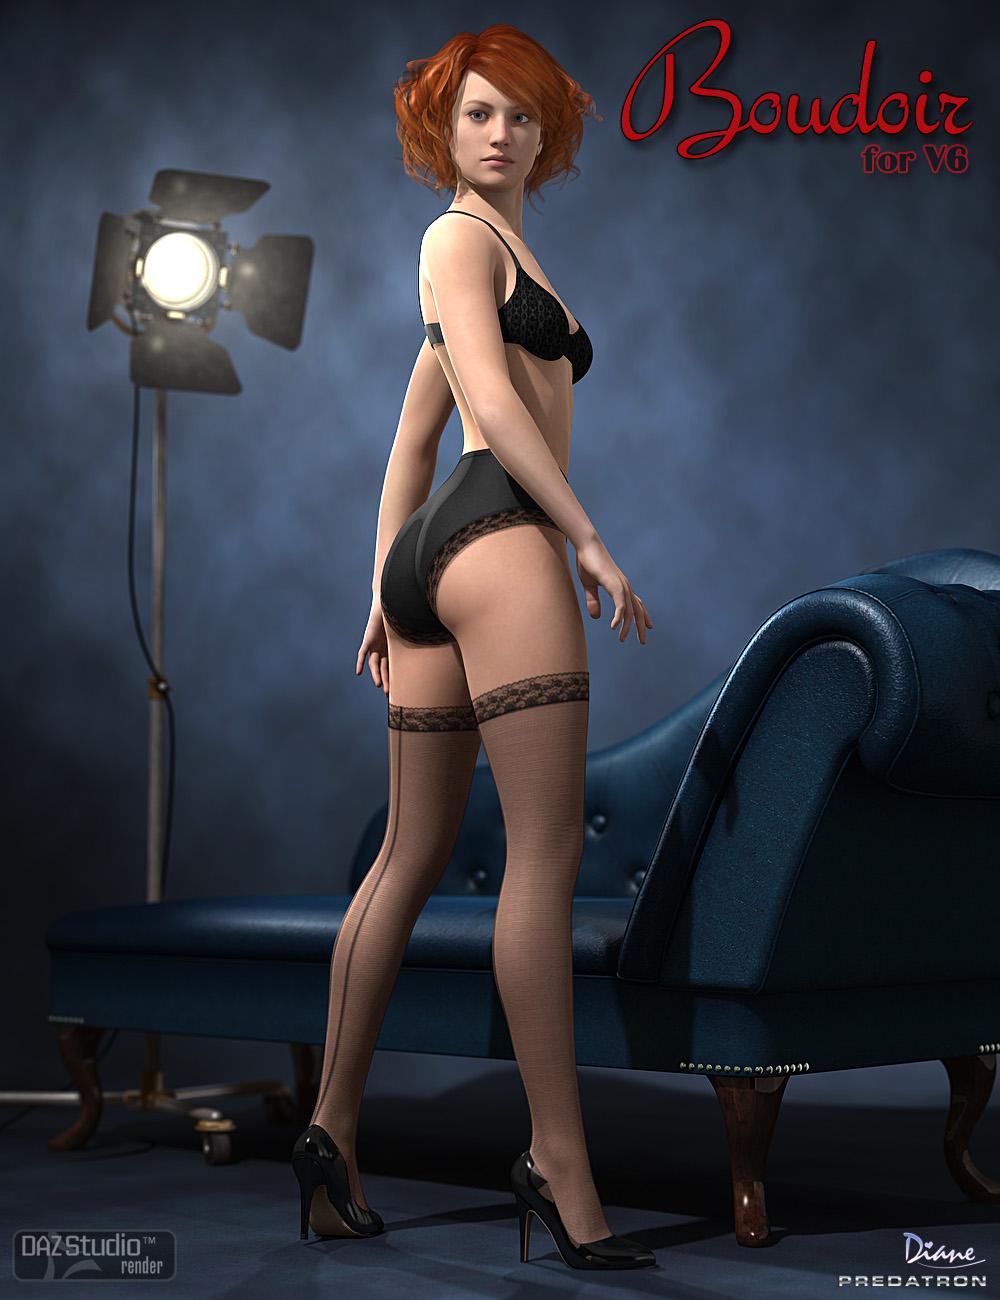 Boudoir for Victoria 6 by: DianePredatron, 3D Models by Daz 3D